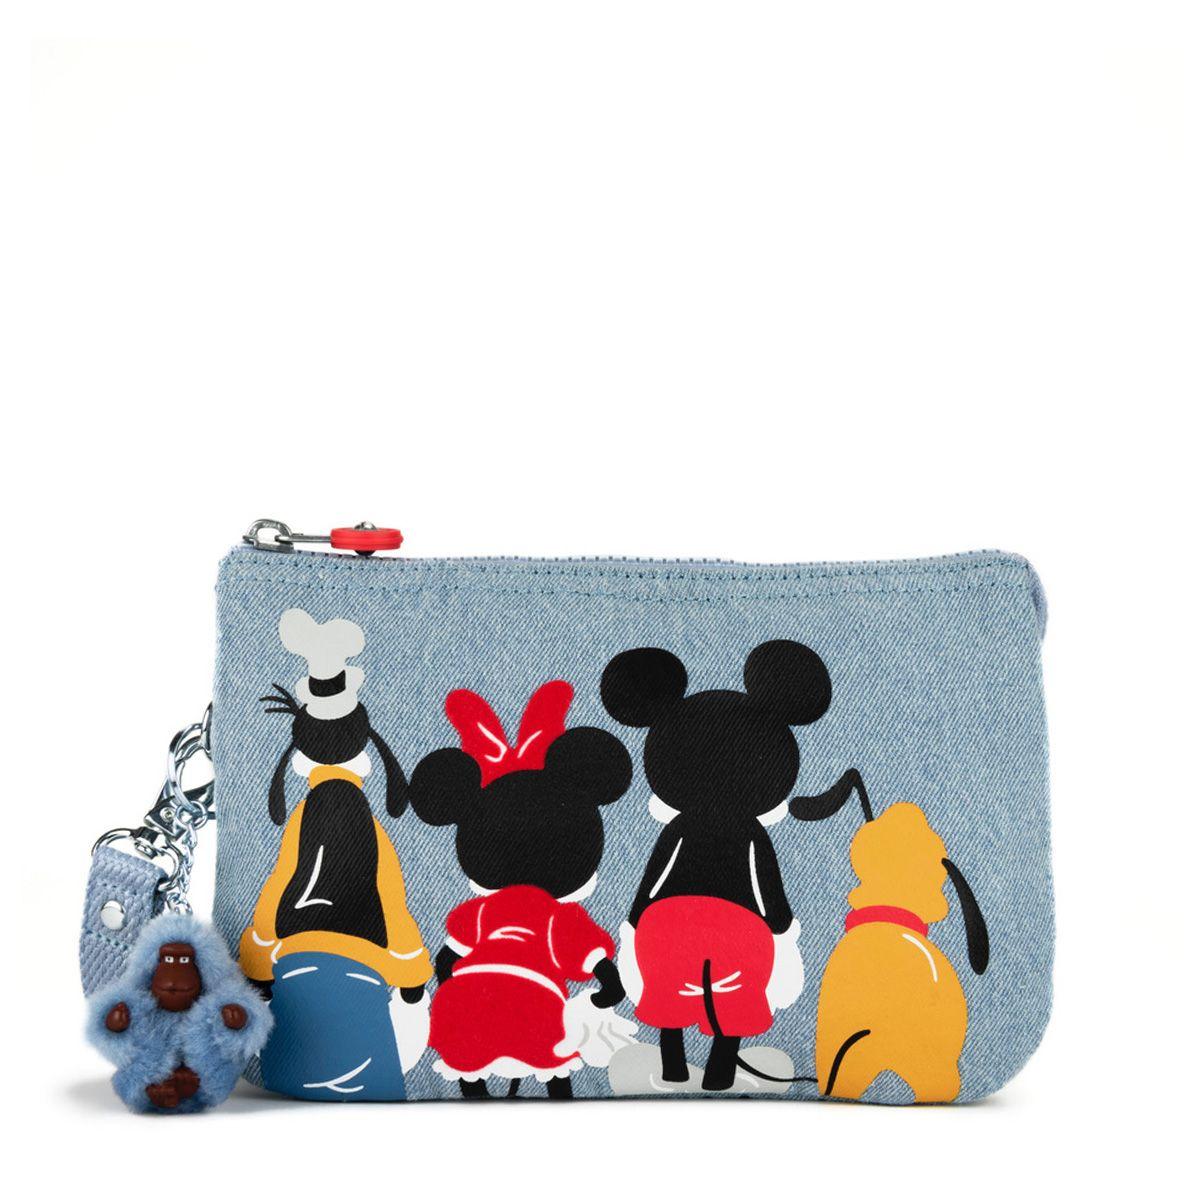 efd72086b804f Kipling Handbags